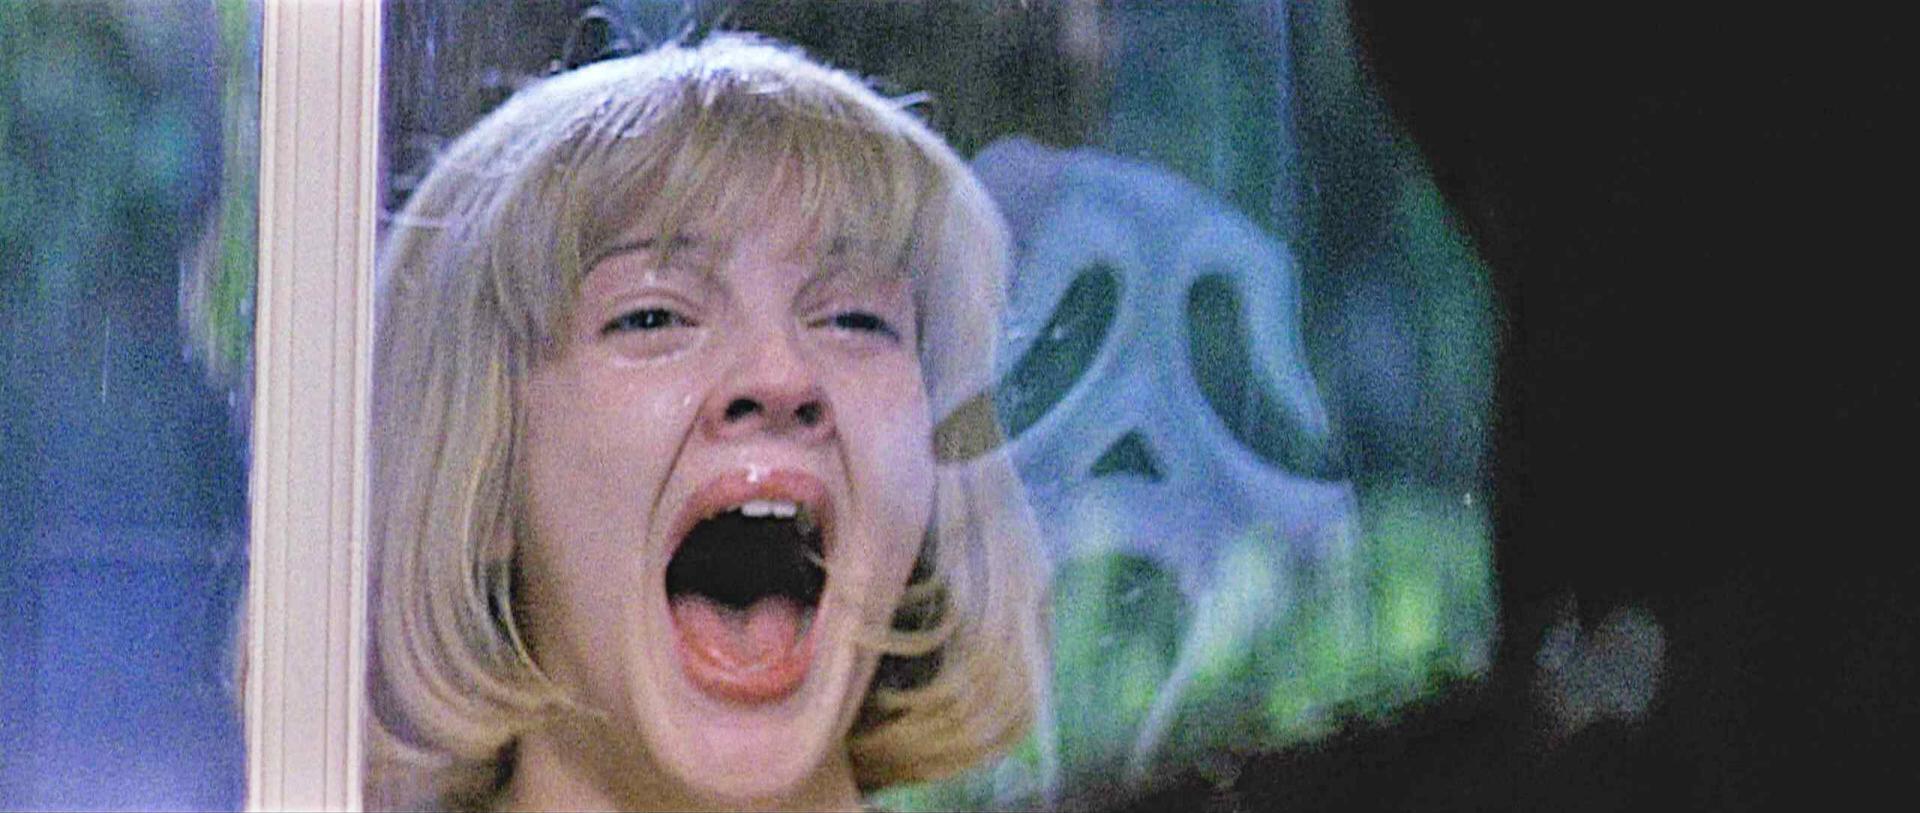 Scream - Sikoly (1996)